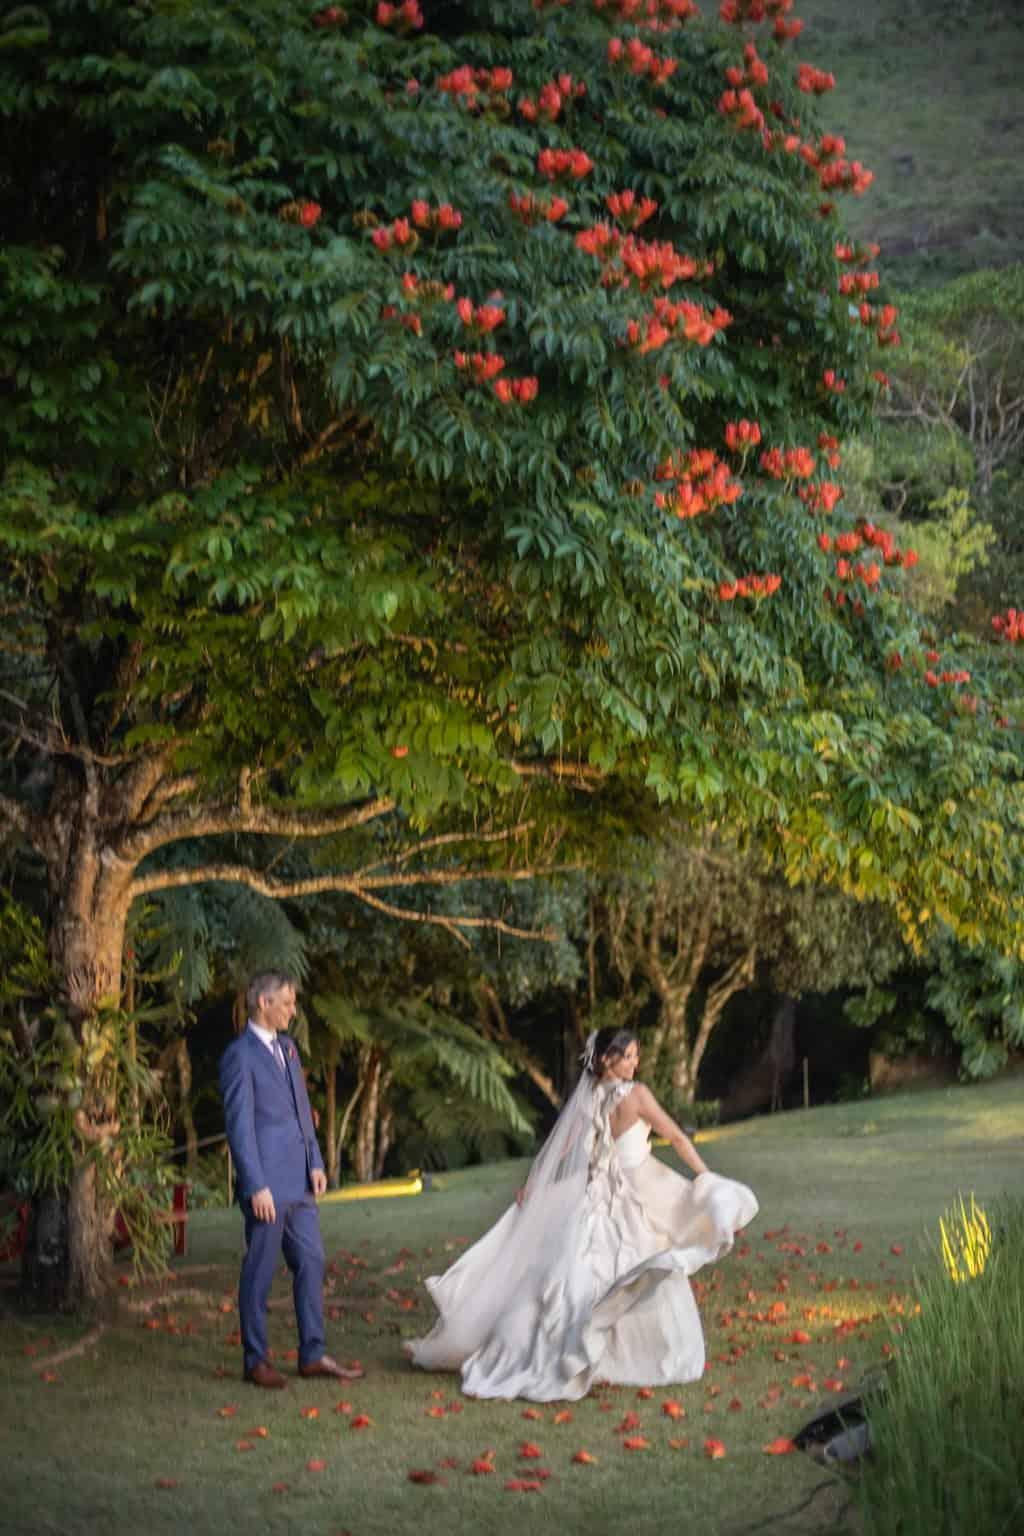 casamento-na-serra-foto-dos-noivos-Fotografia-Laura-Campanella-fotos-a-tarde-graviola-filmes-Juliana-e-Sebastian-noivos-no-altar-Pousada-La-Belle-Bruna116